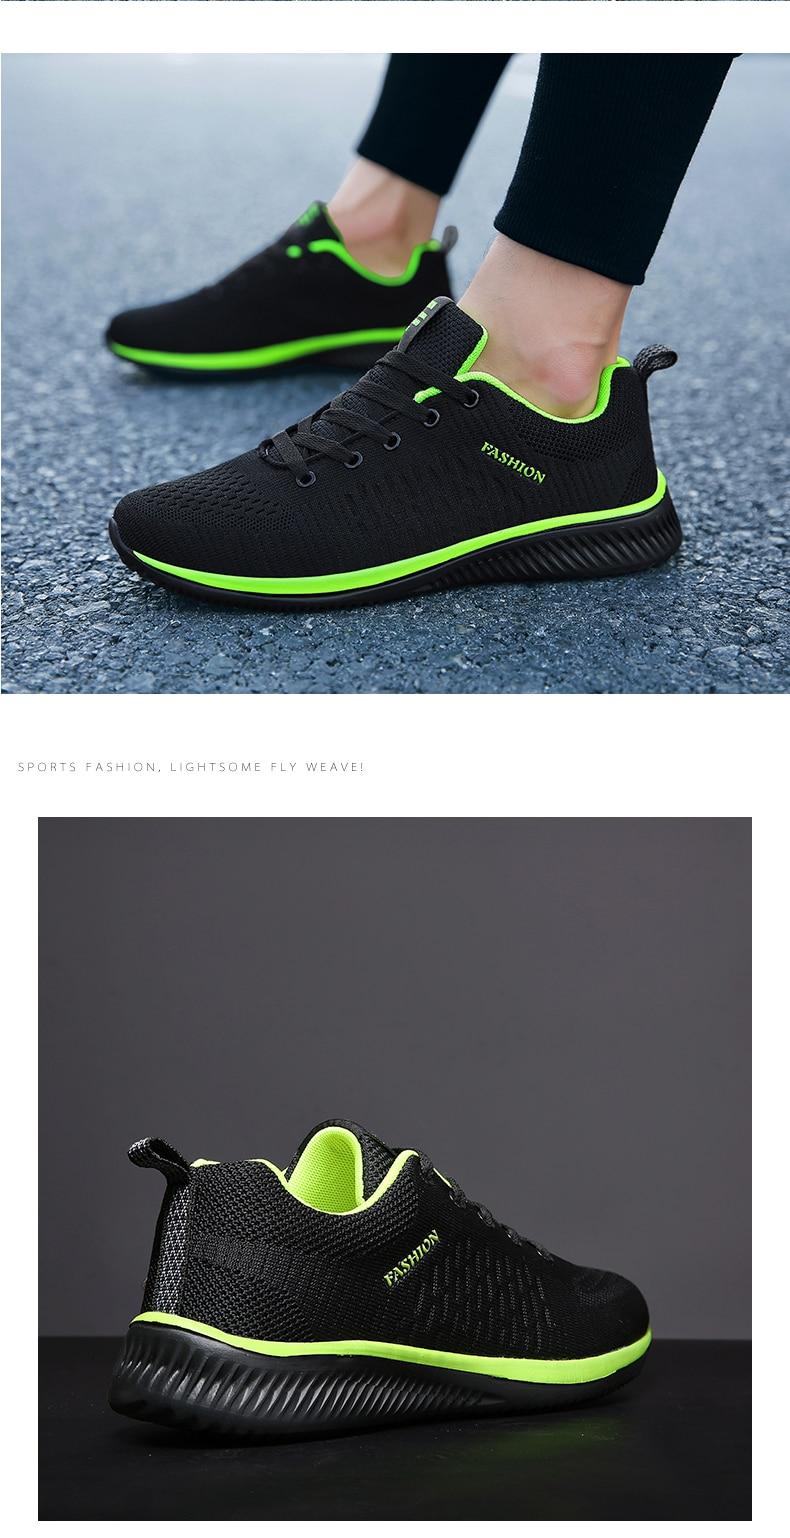 Hc08b6deec0104dee86d58dccec2e86929 New Mesh Men Casual Shoes Lac-up Men Shoes Lightweight Comfortable Breathable Walking Sneakers Tenis masculino Zapatillas Hombre